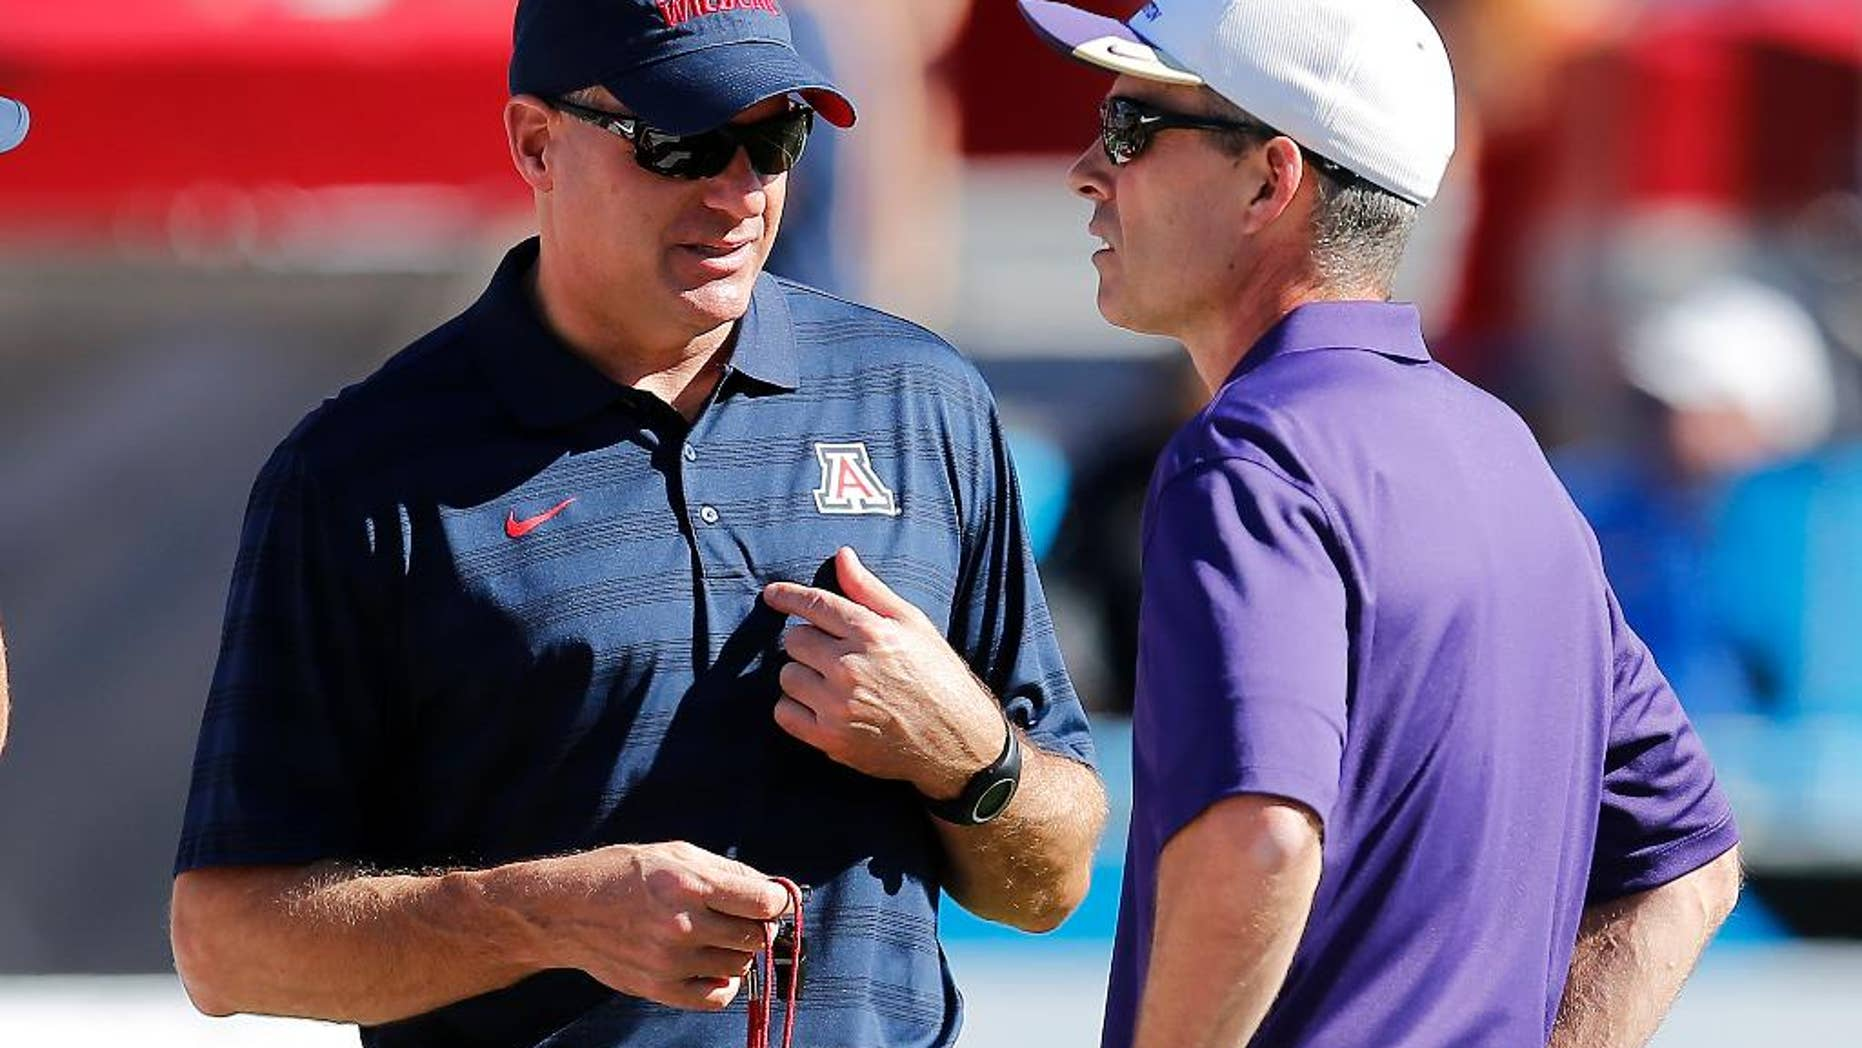 Arizona head coach Rich Rodriguez, left, and Washington head coach Chris Petersen talk before an NCAA college football game, Saturday, Nov. 15, 2014, in Tucson, Ariz. (AP Photo/Rick Scuteri)